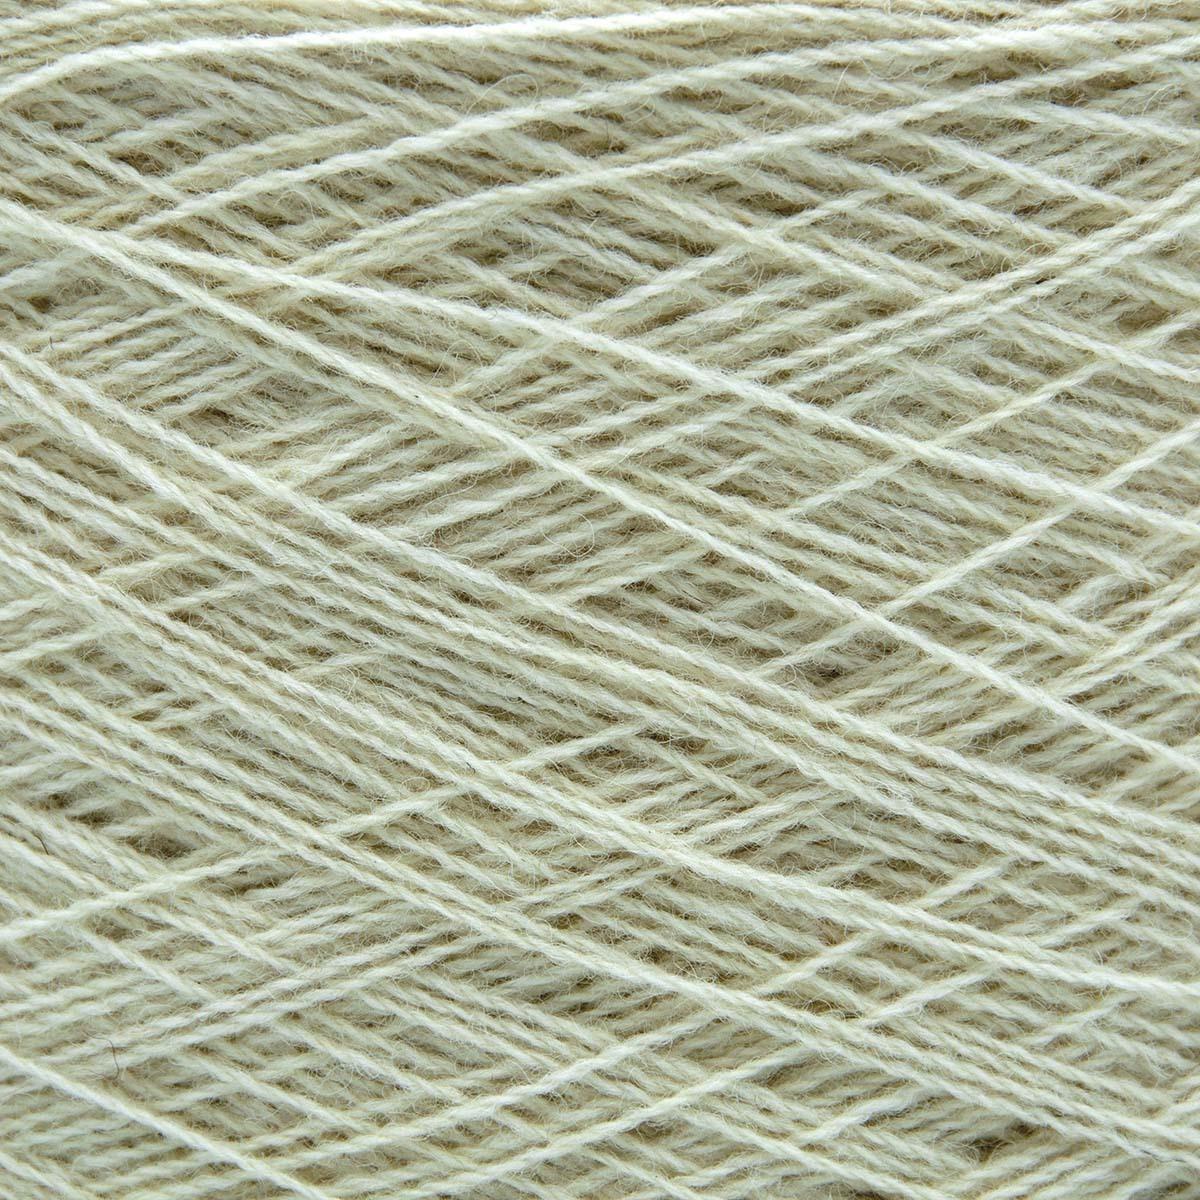 Knoll Yarns Shetland - 001